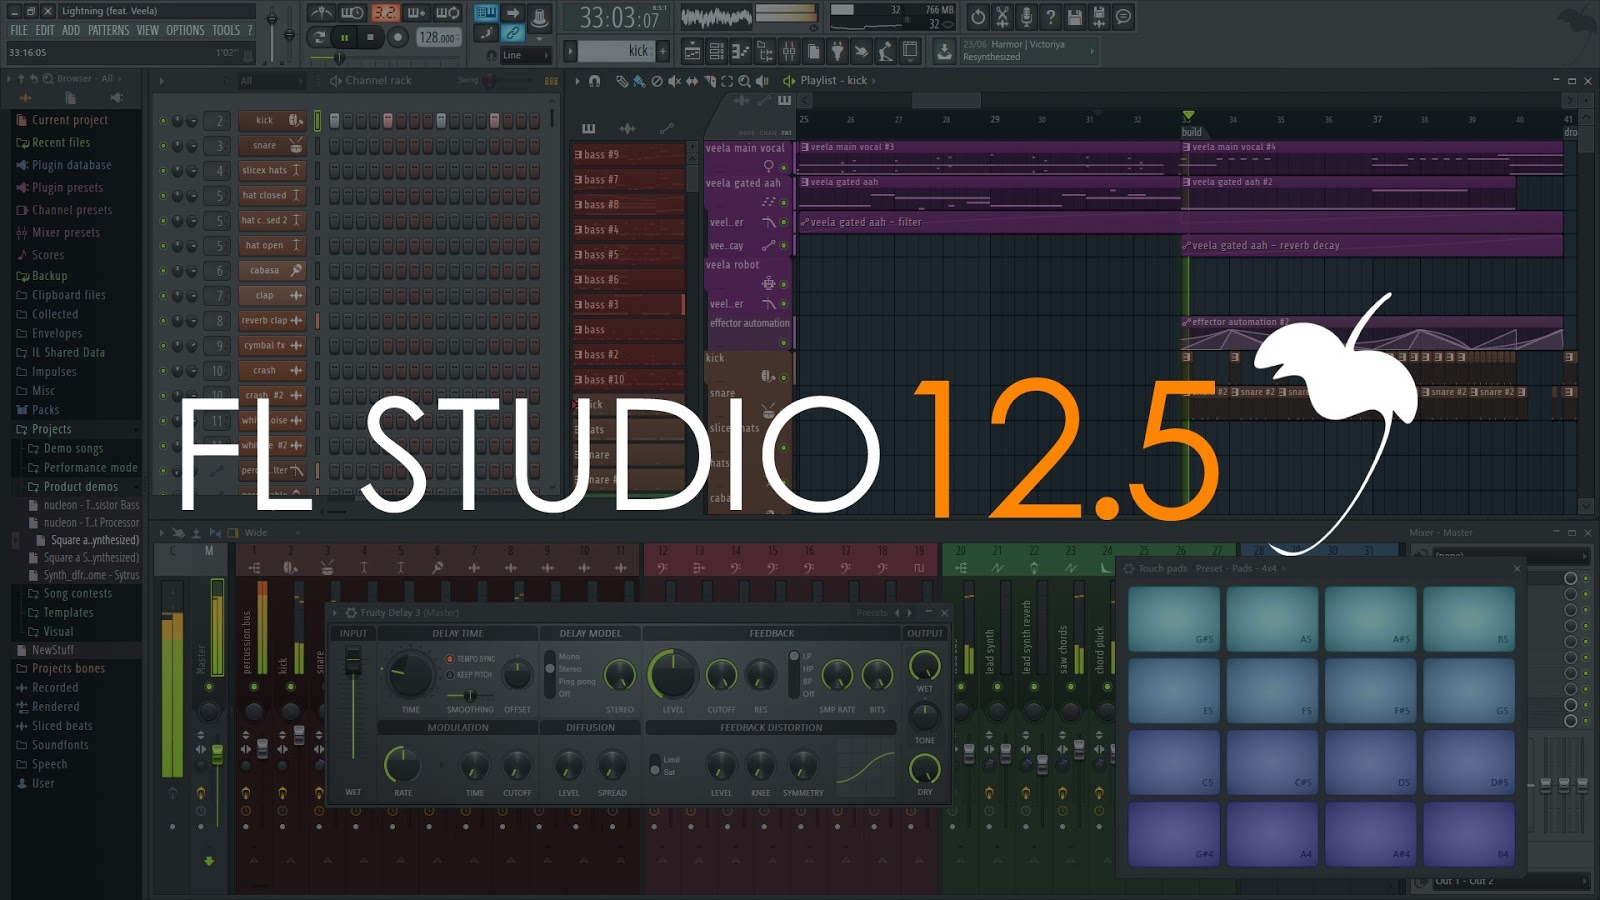 fl studio 12.5 1.5 crack free download